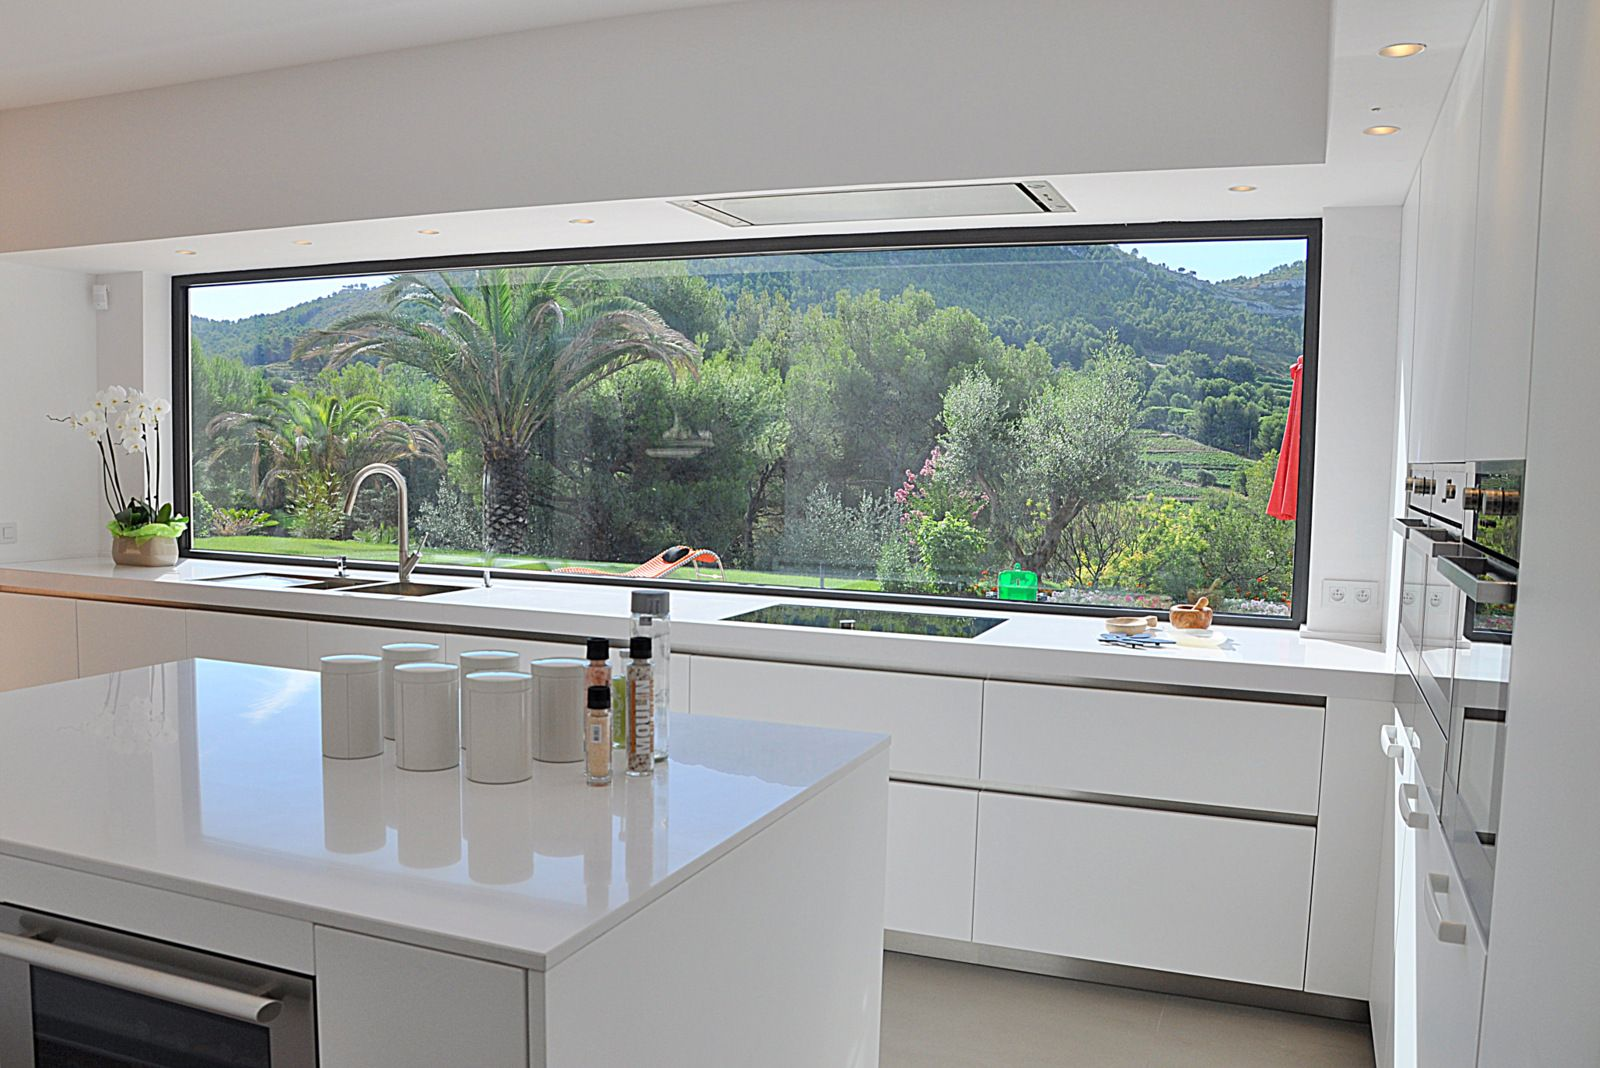 Sinibaldi projet cuisine cassis 5 baies vitrees en 2019 cuisine moderne veranda cuisine et - Cuisine avec vitre ...